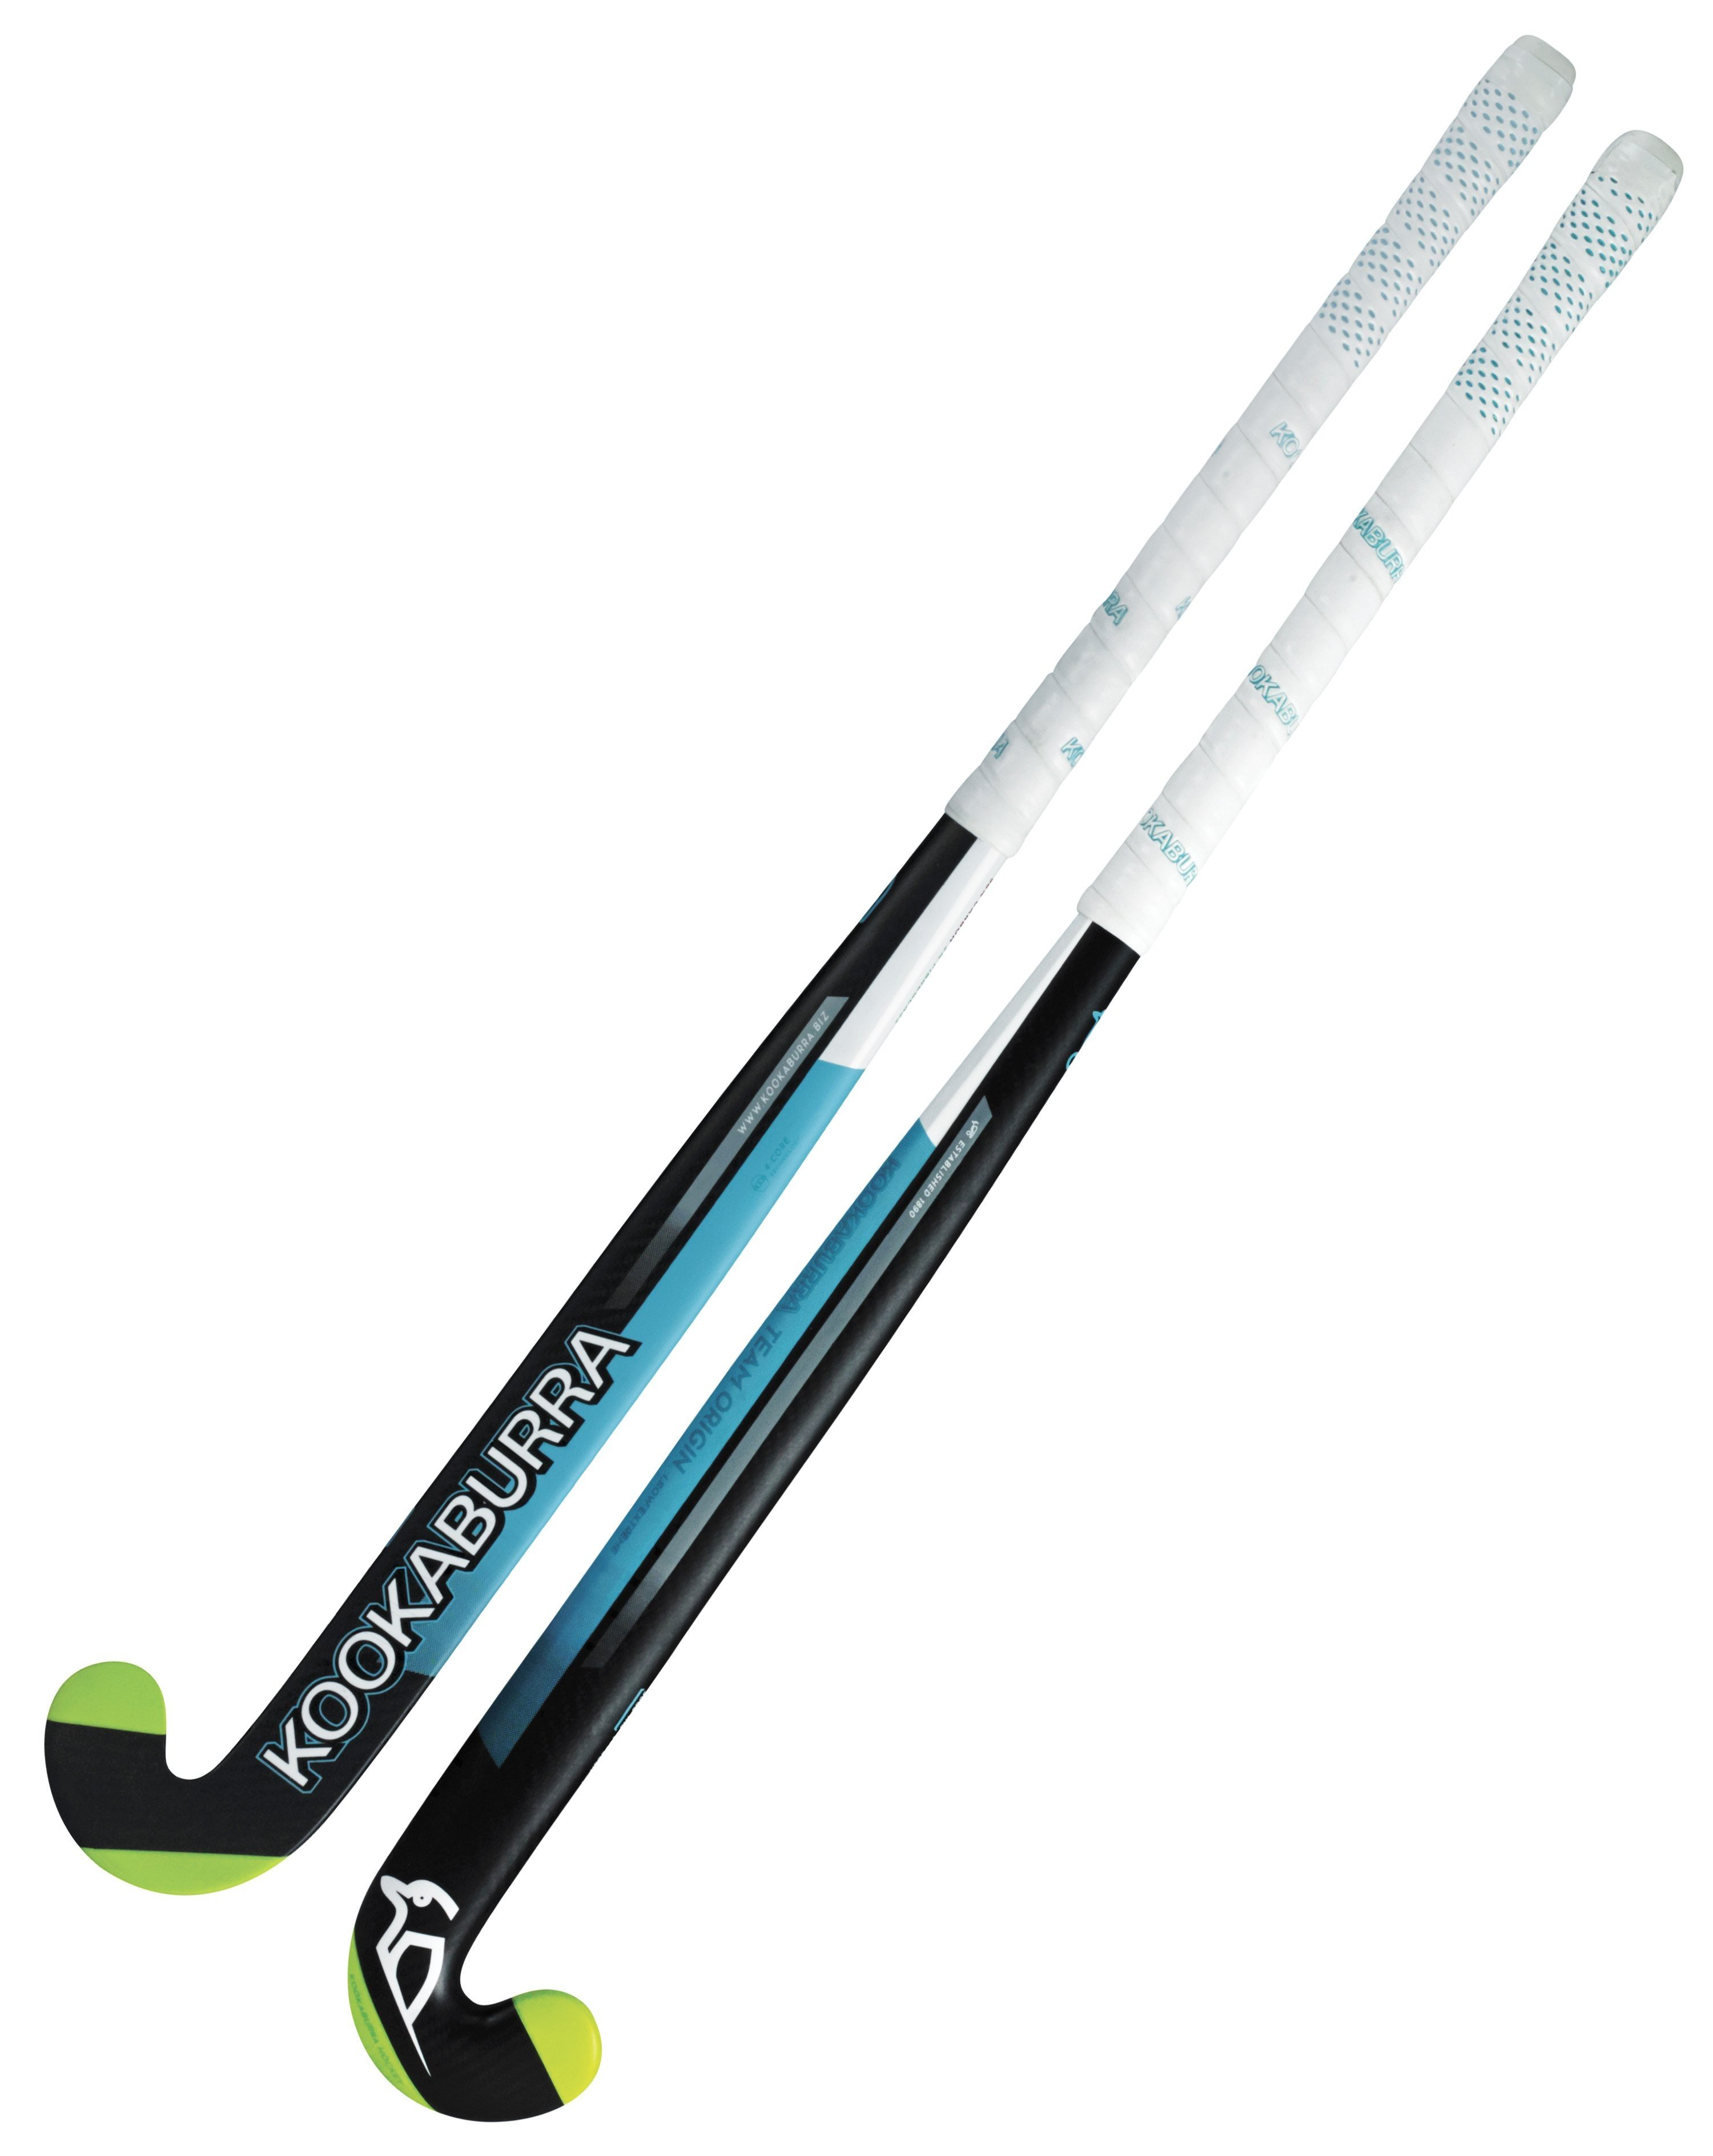 2016/17 Kookaburra Team Origin Lbow Extreme Hockey Stick